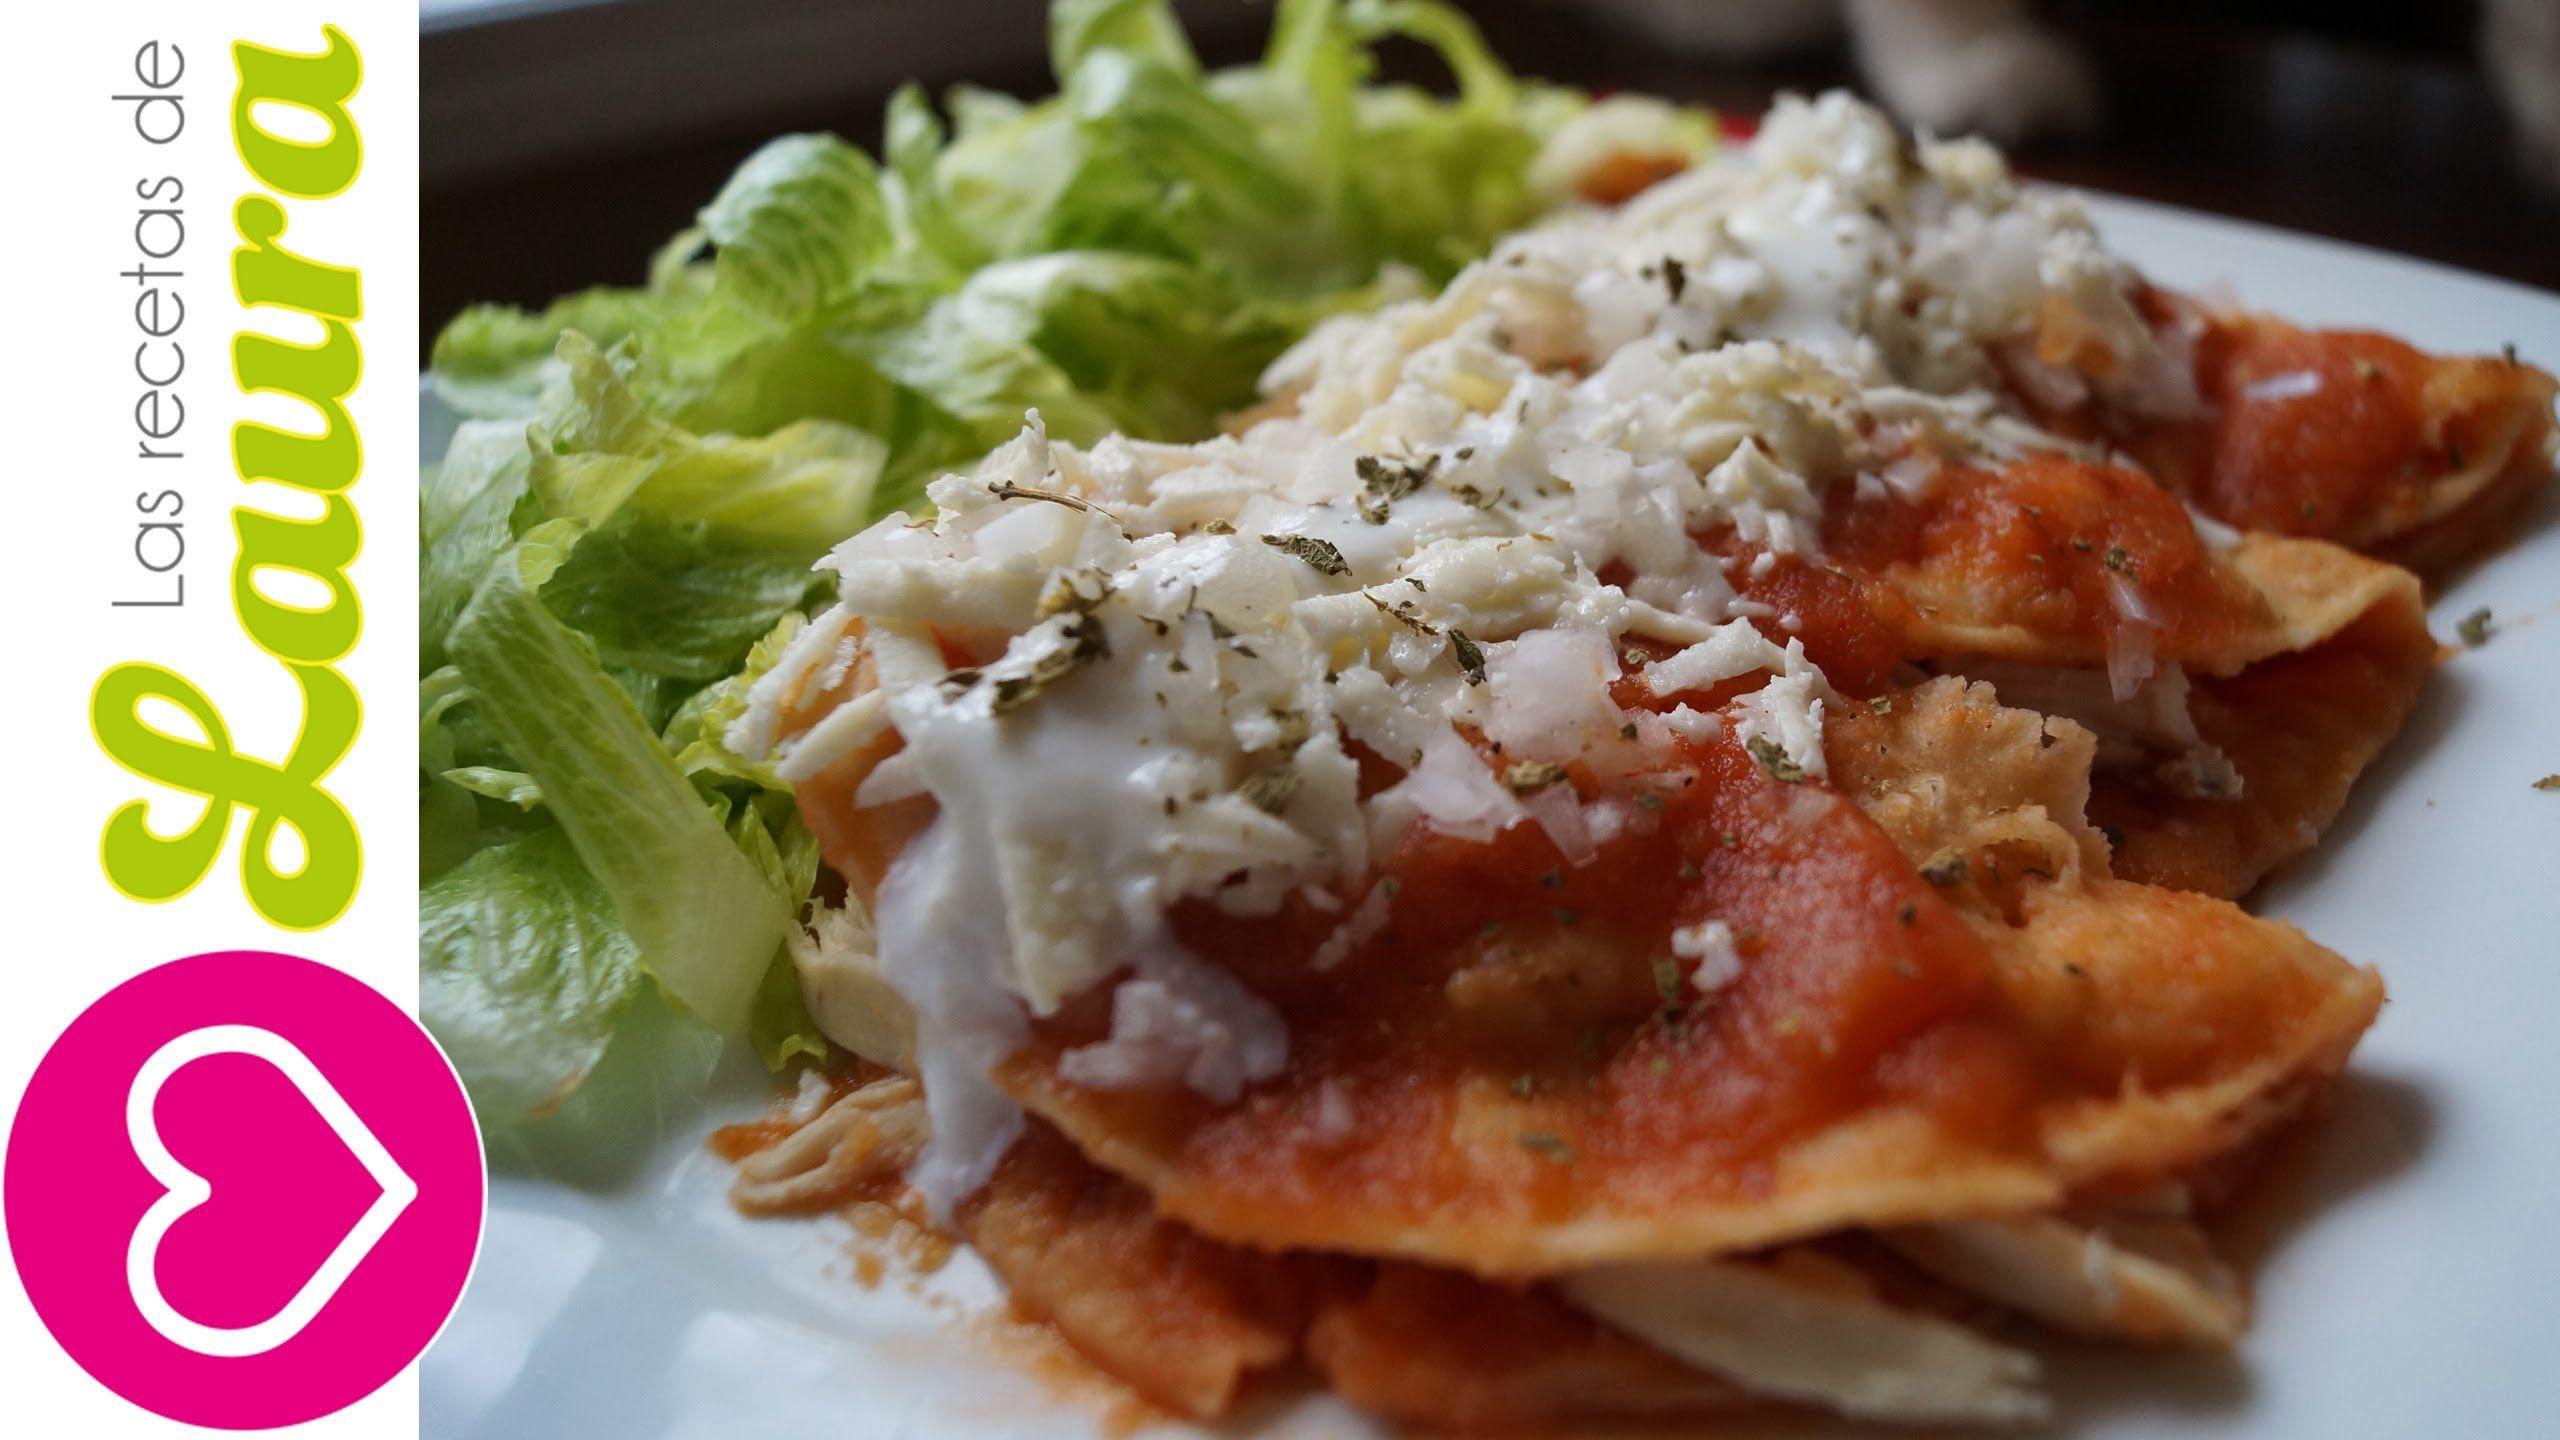 Como hacer comida vegetariana facil recetas para cocinar for Como hacer comida facil